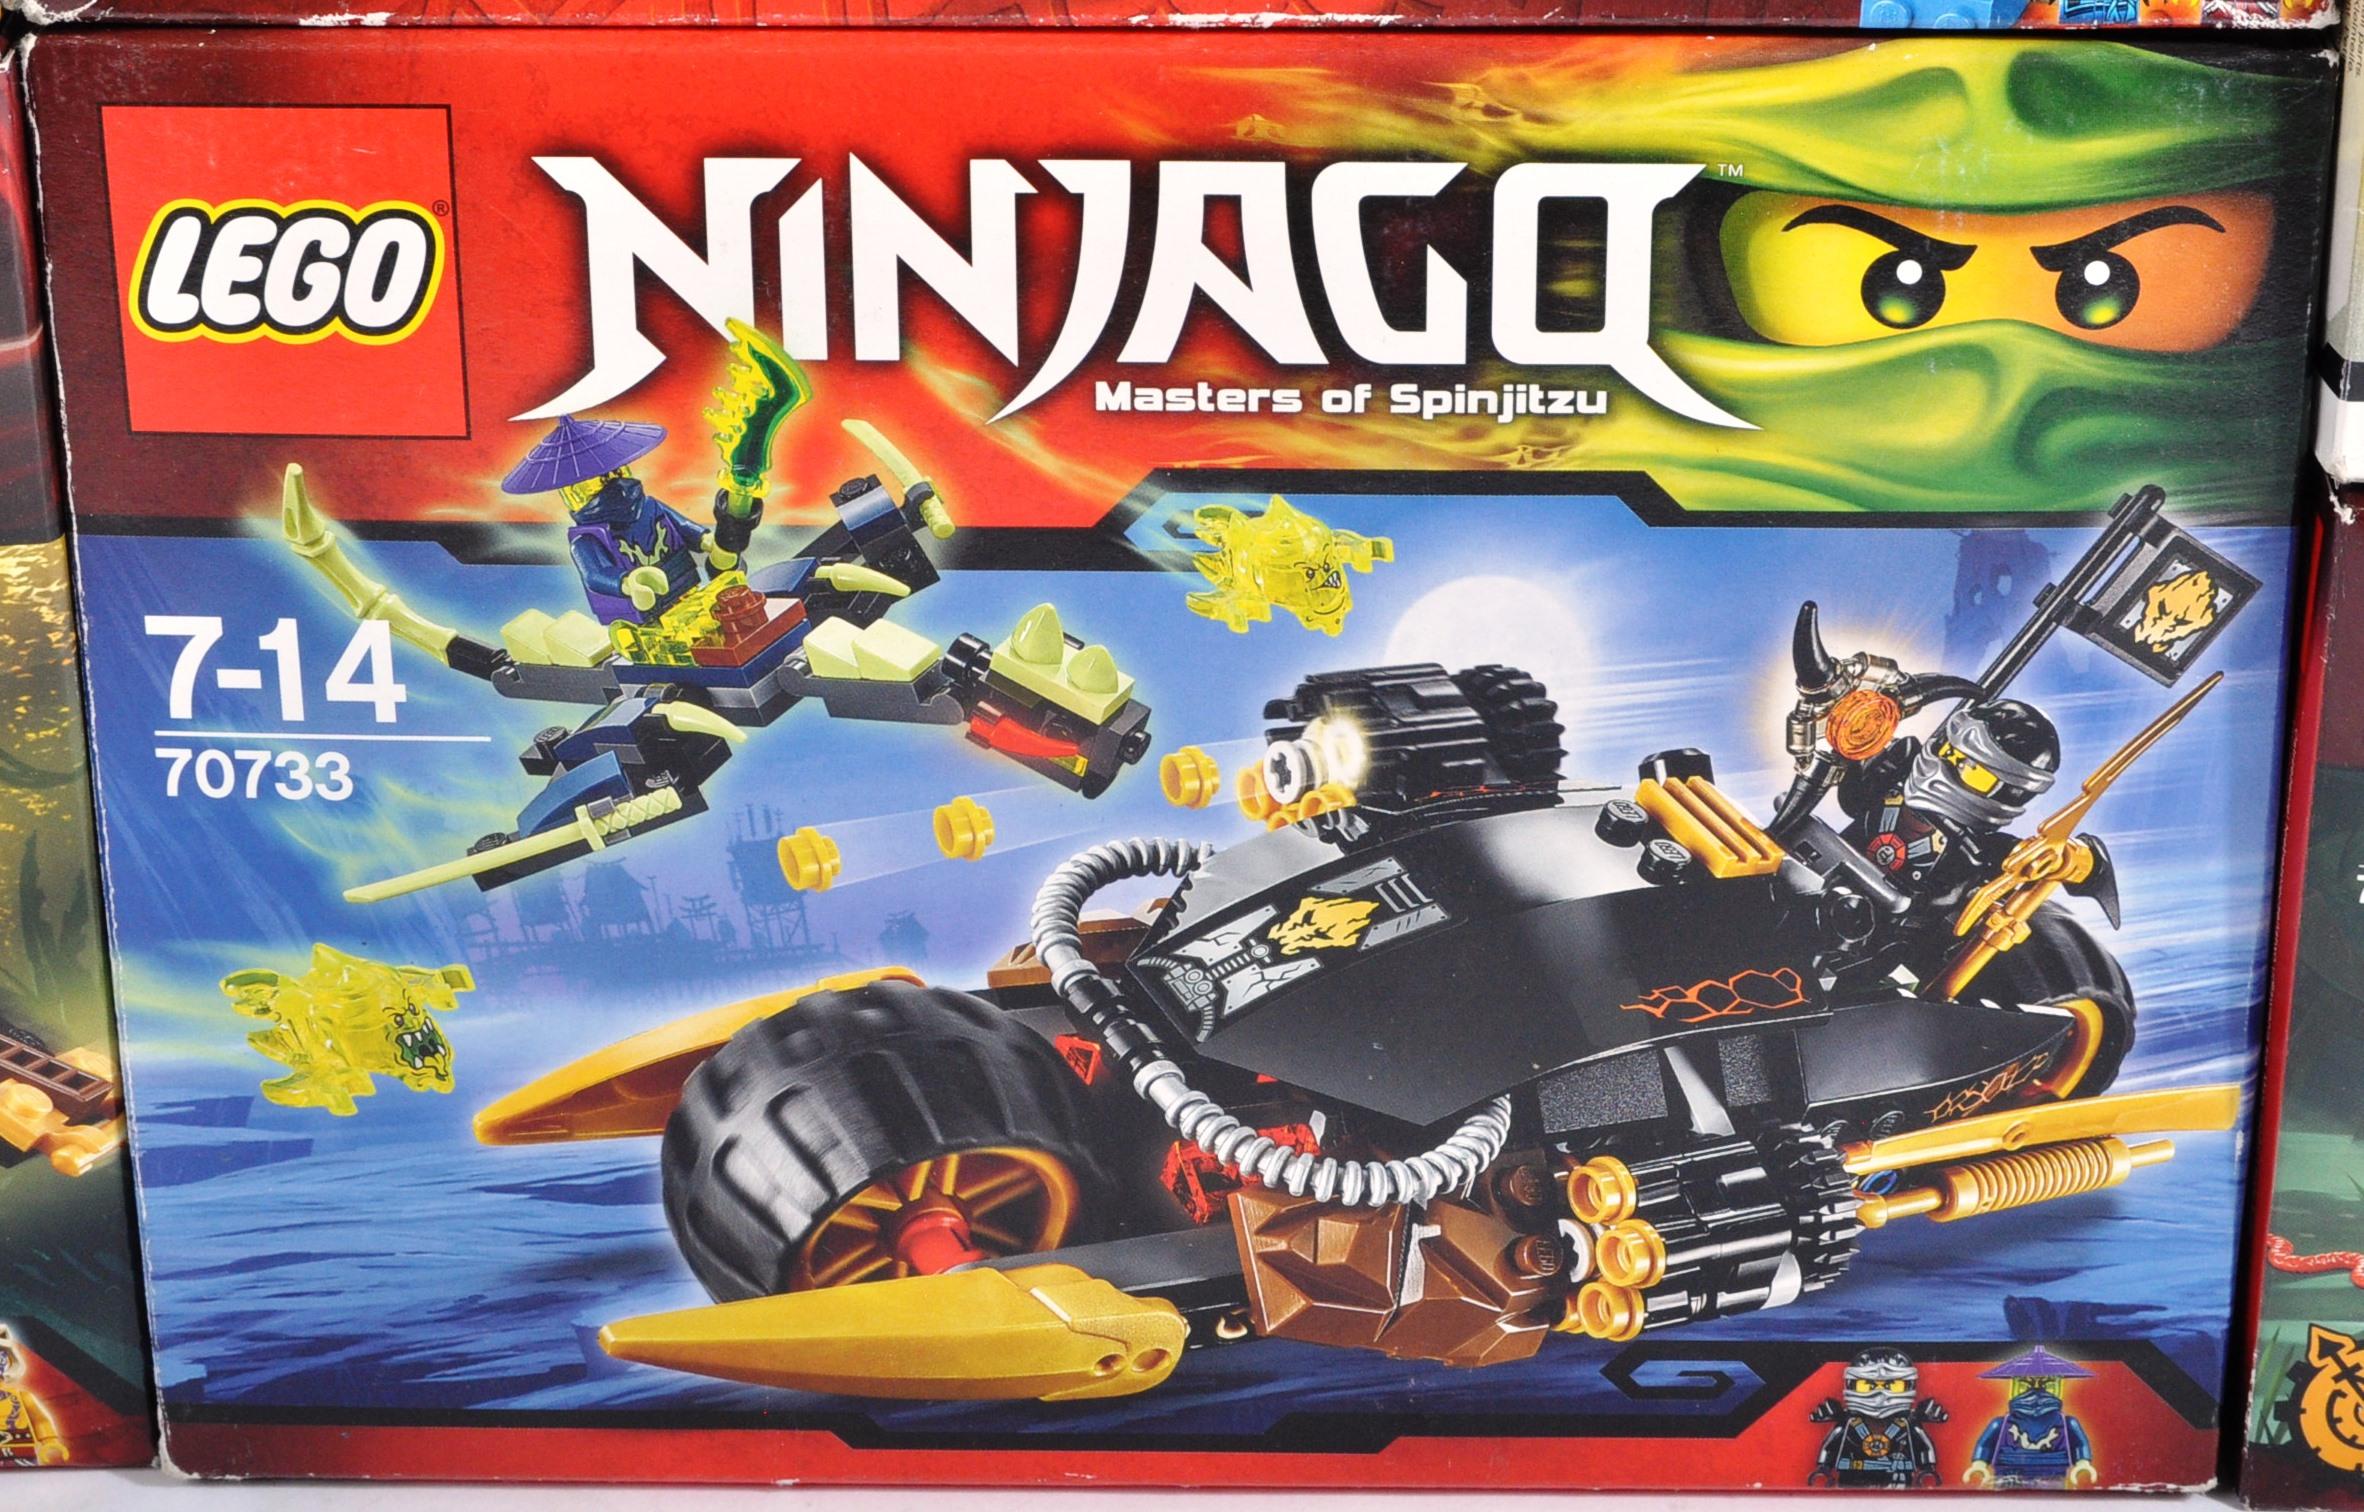 LEGO SETS - LEGO NINJAGO - COLLECTION OF X8 LEGO NINJAGO SETS - Image 7 of 9